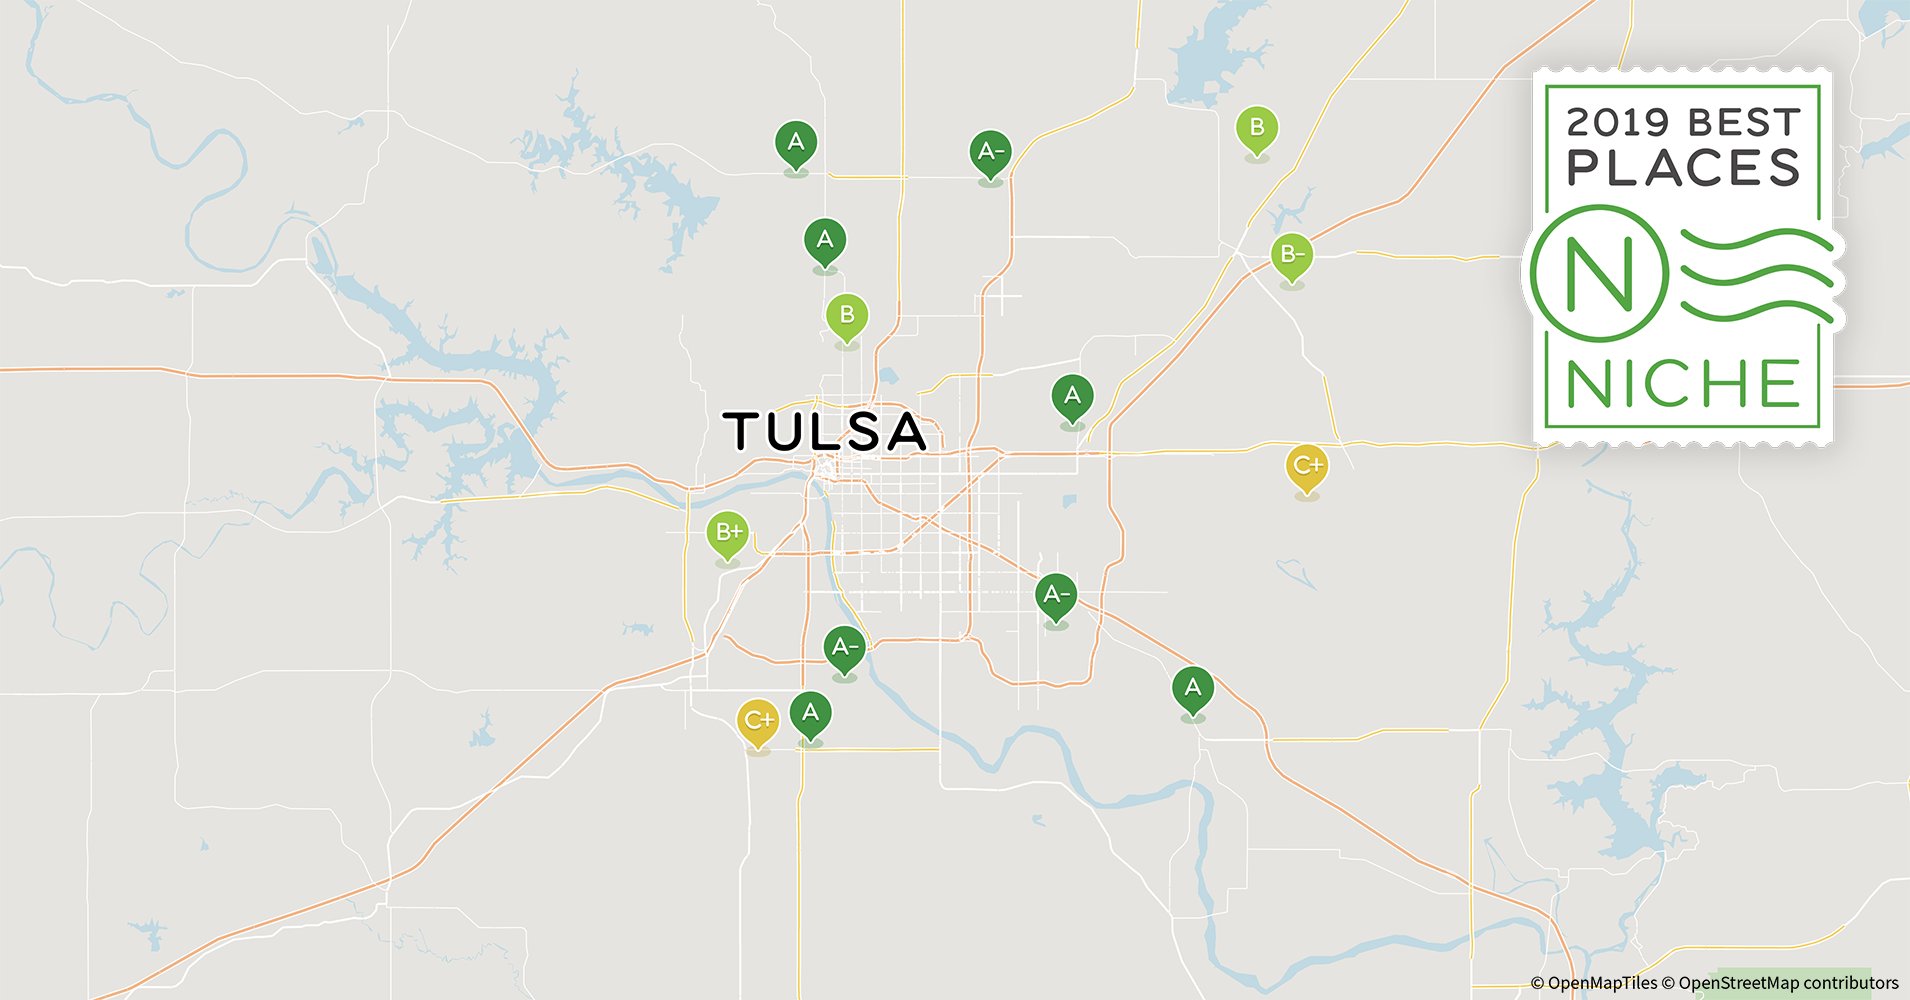 2019 Safe Suburbs Of Tulsa Area Niche